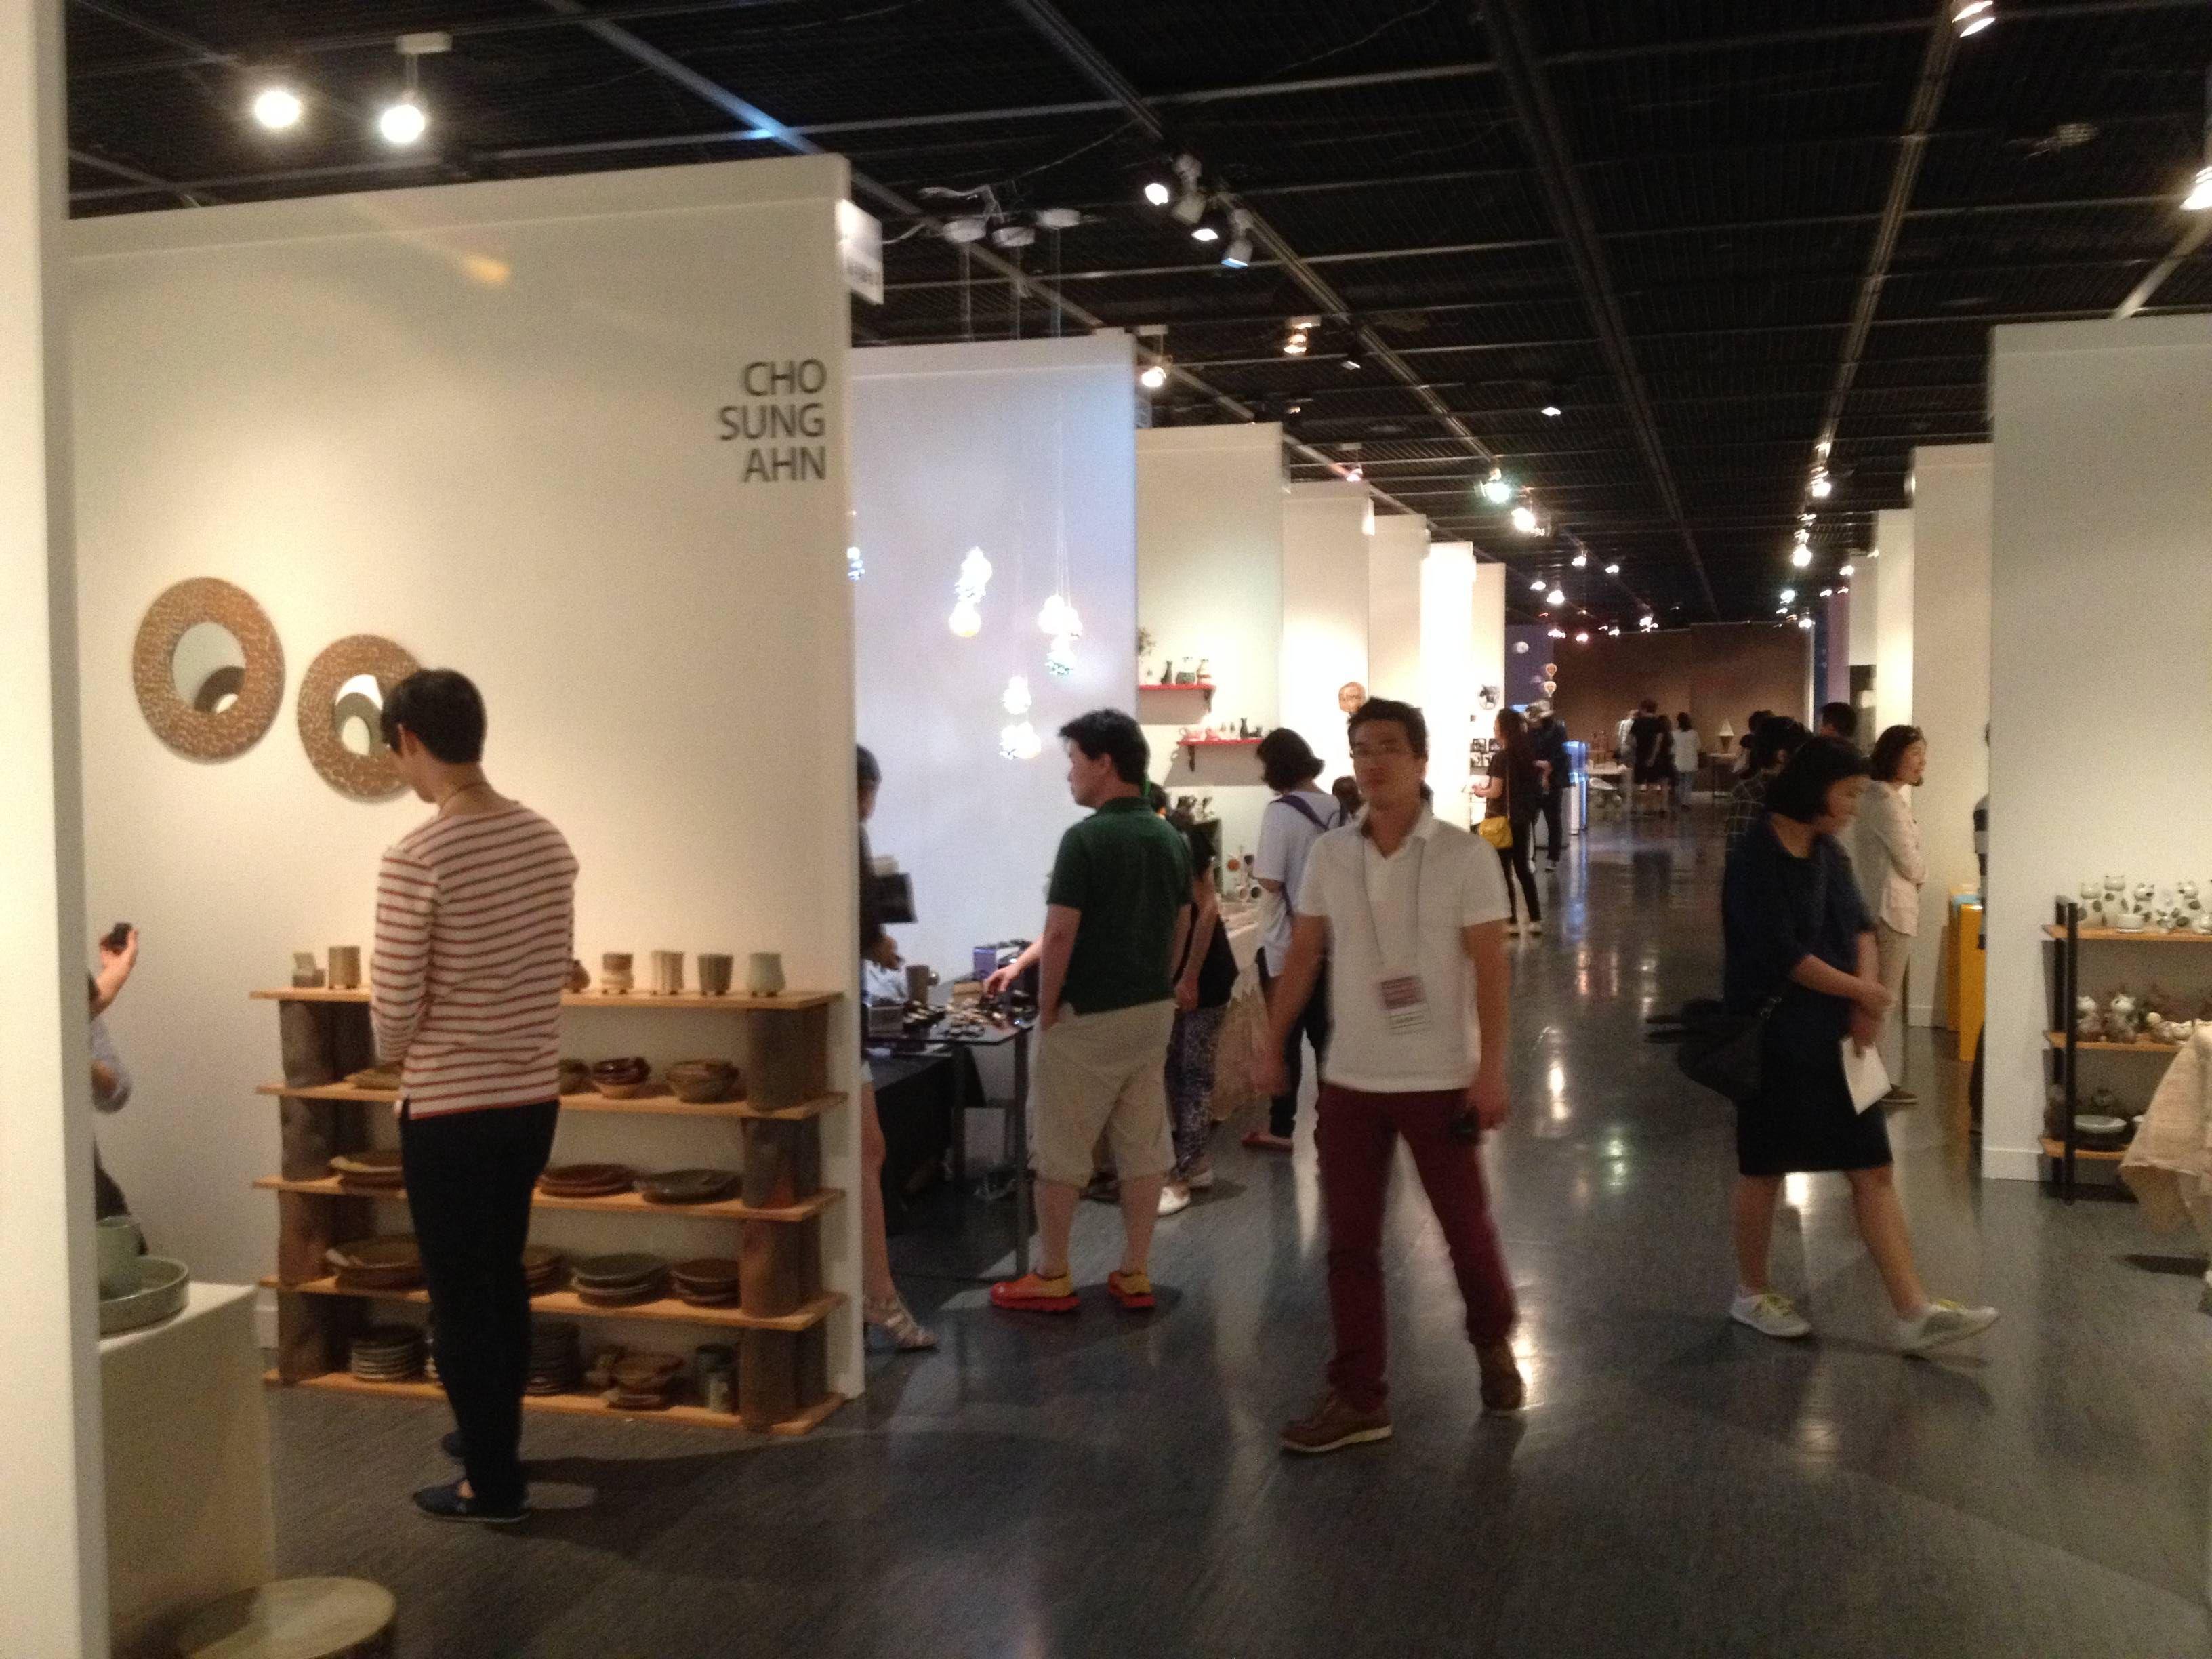 2014-06-07 Seoul Arts Center 043